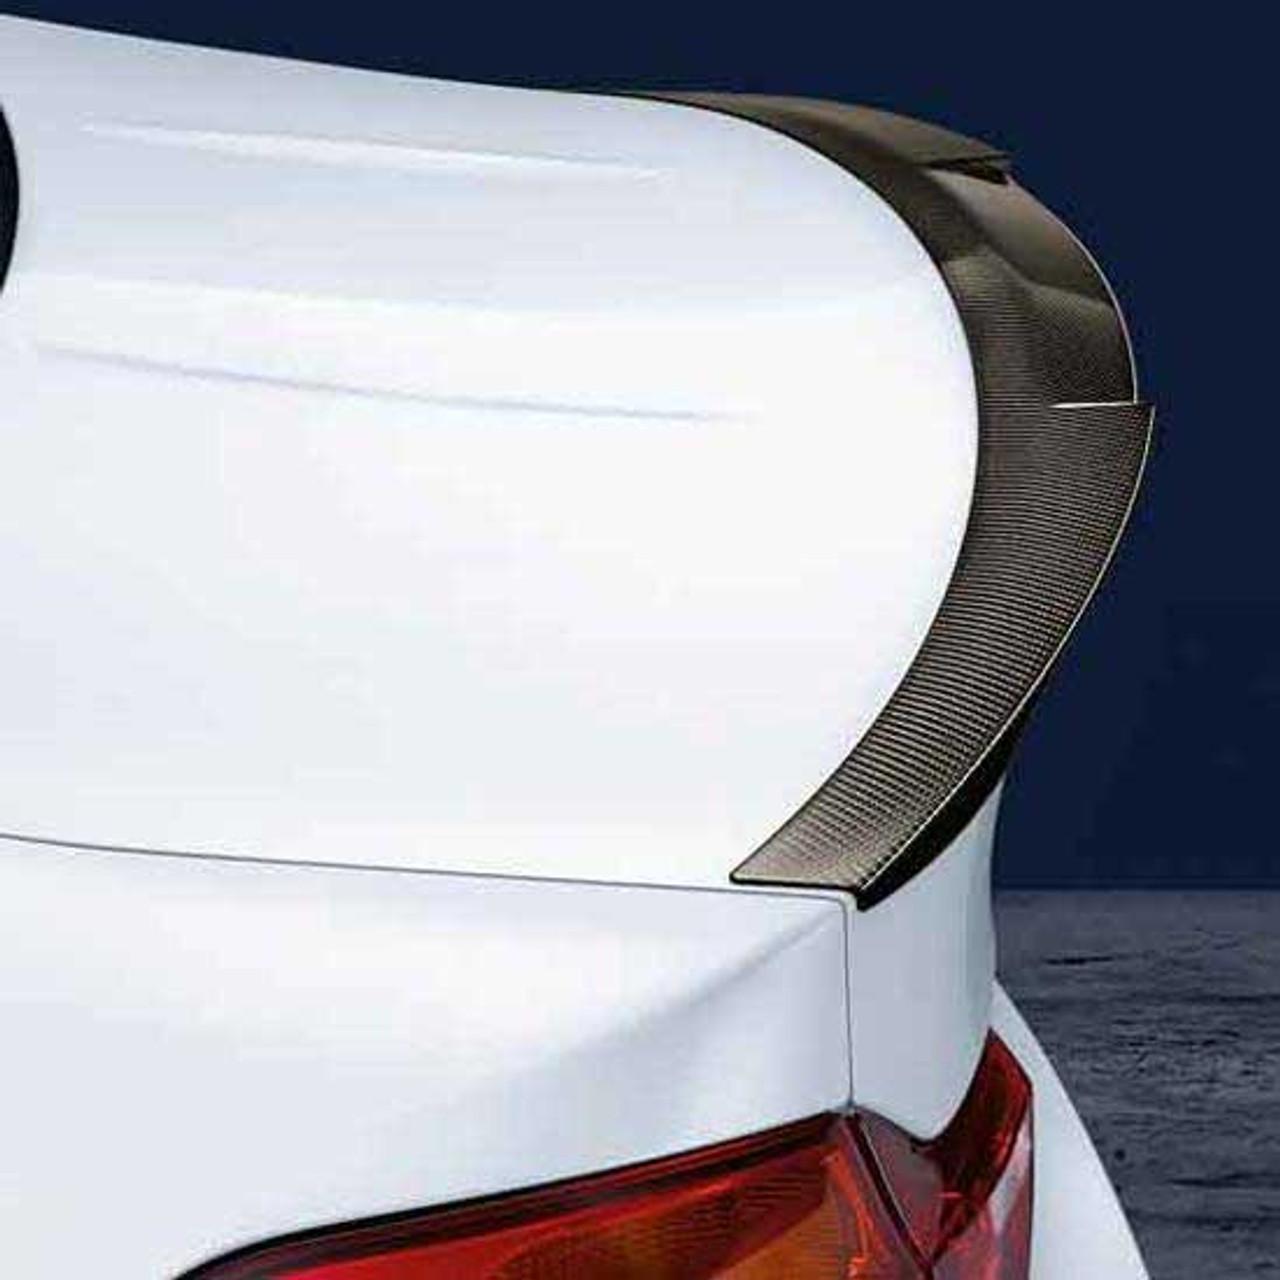 BMW Carbon Fiber Rear Deck Spoiler, F82 M4